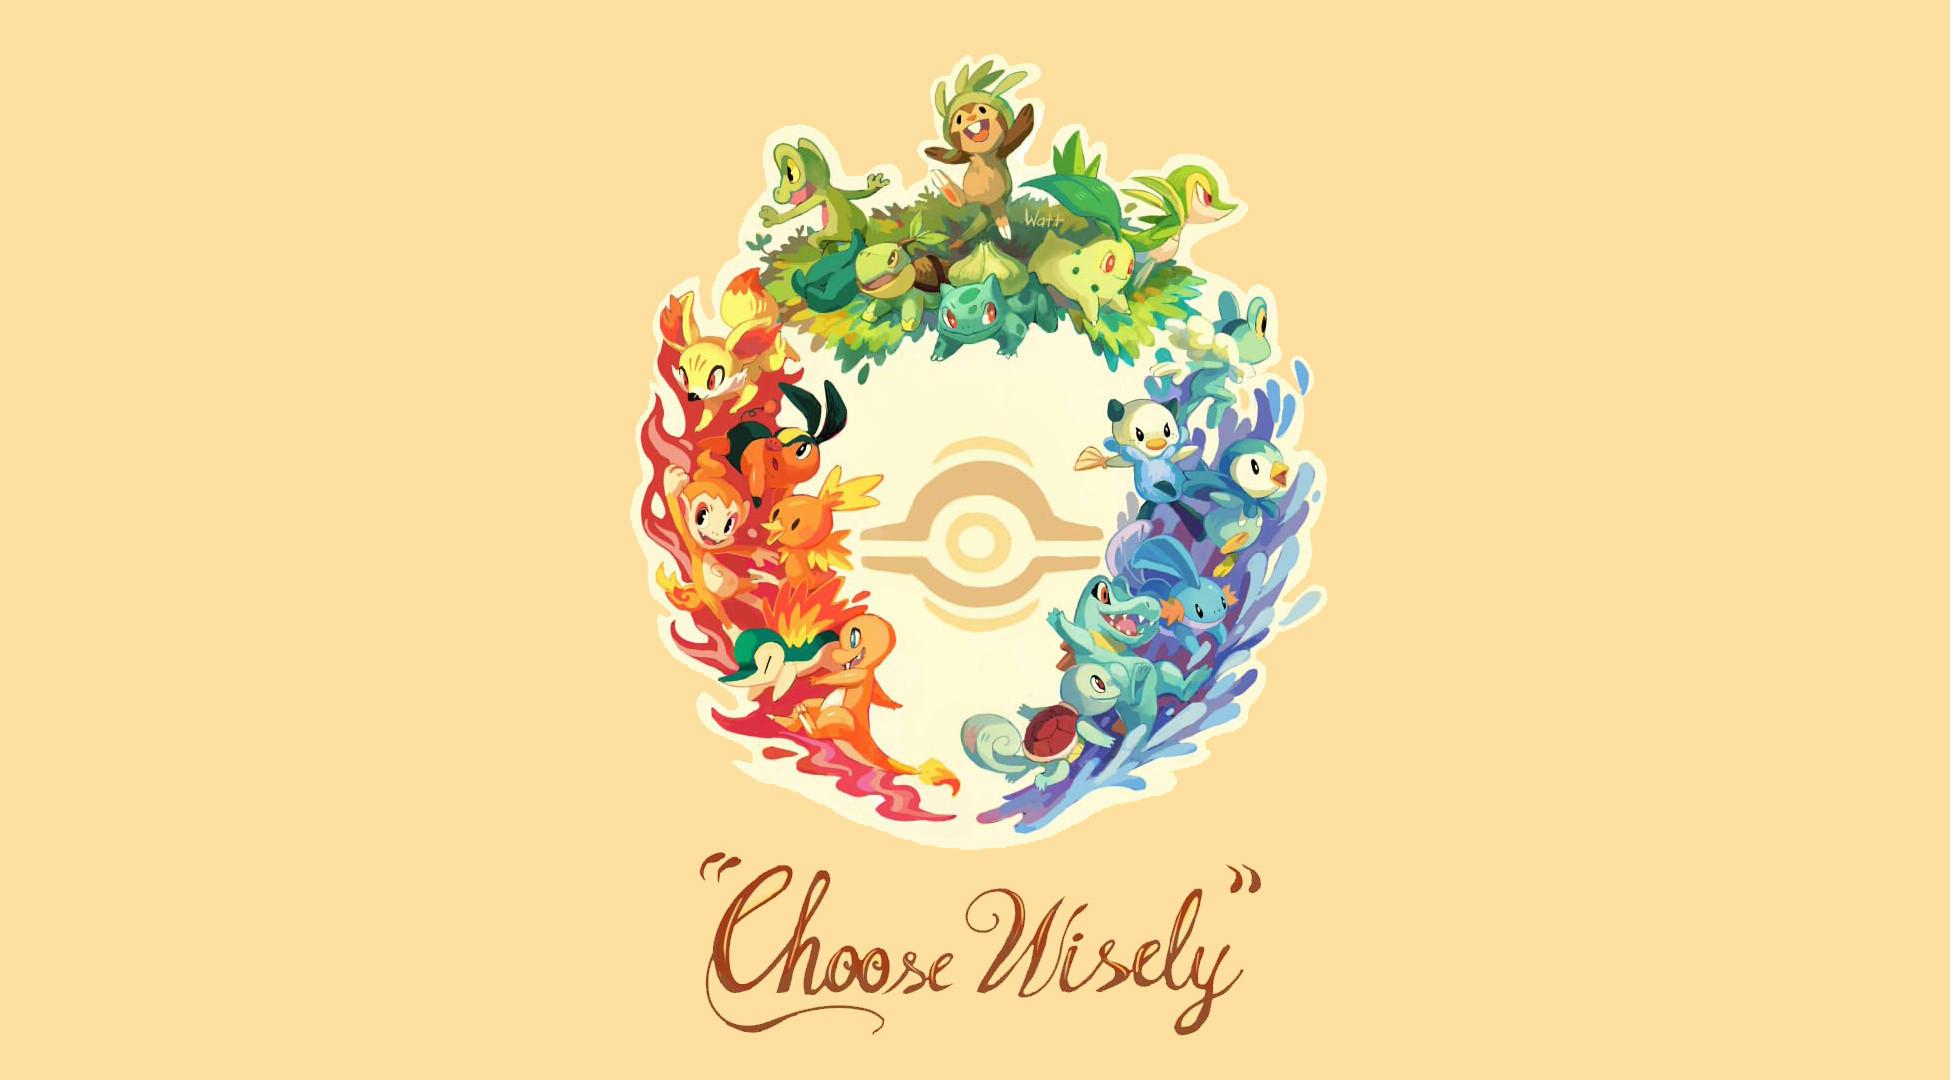 ipad backgrounds pokemon wallpaper details :